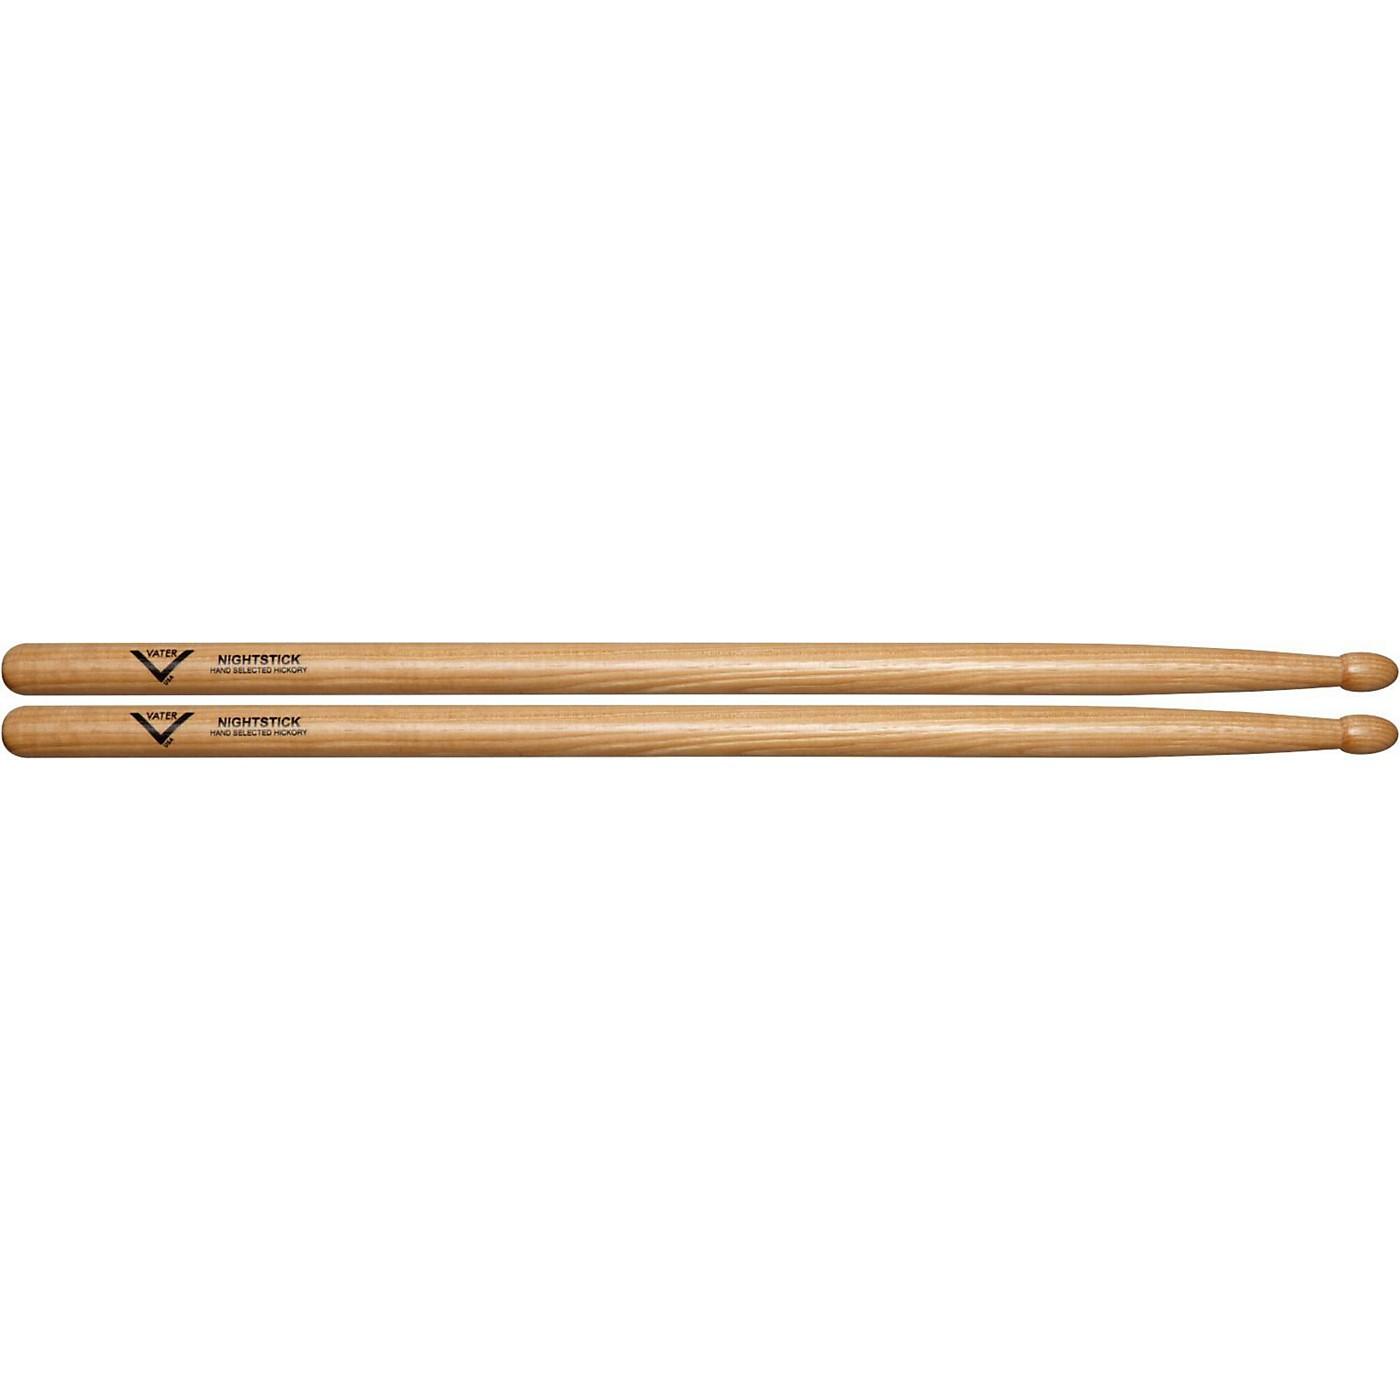 Vater American Hickory Nightstick 2S Drum Sticks thumbnail